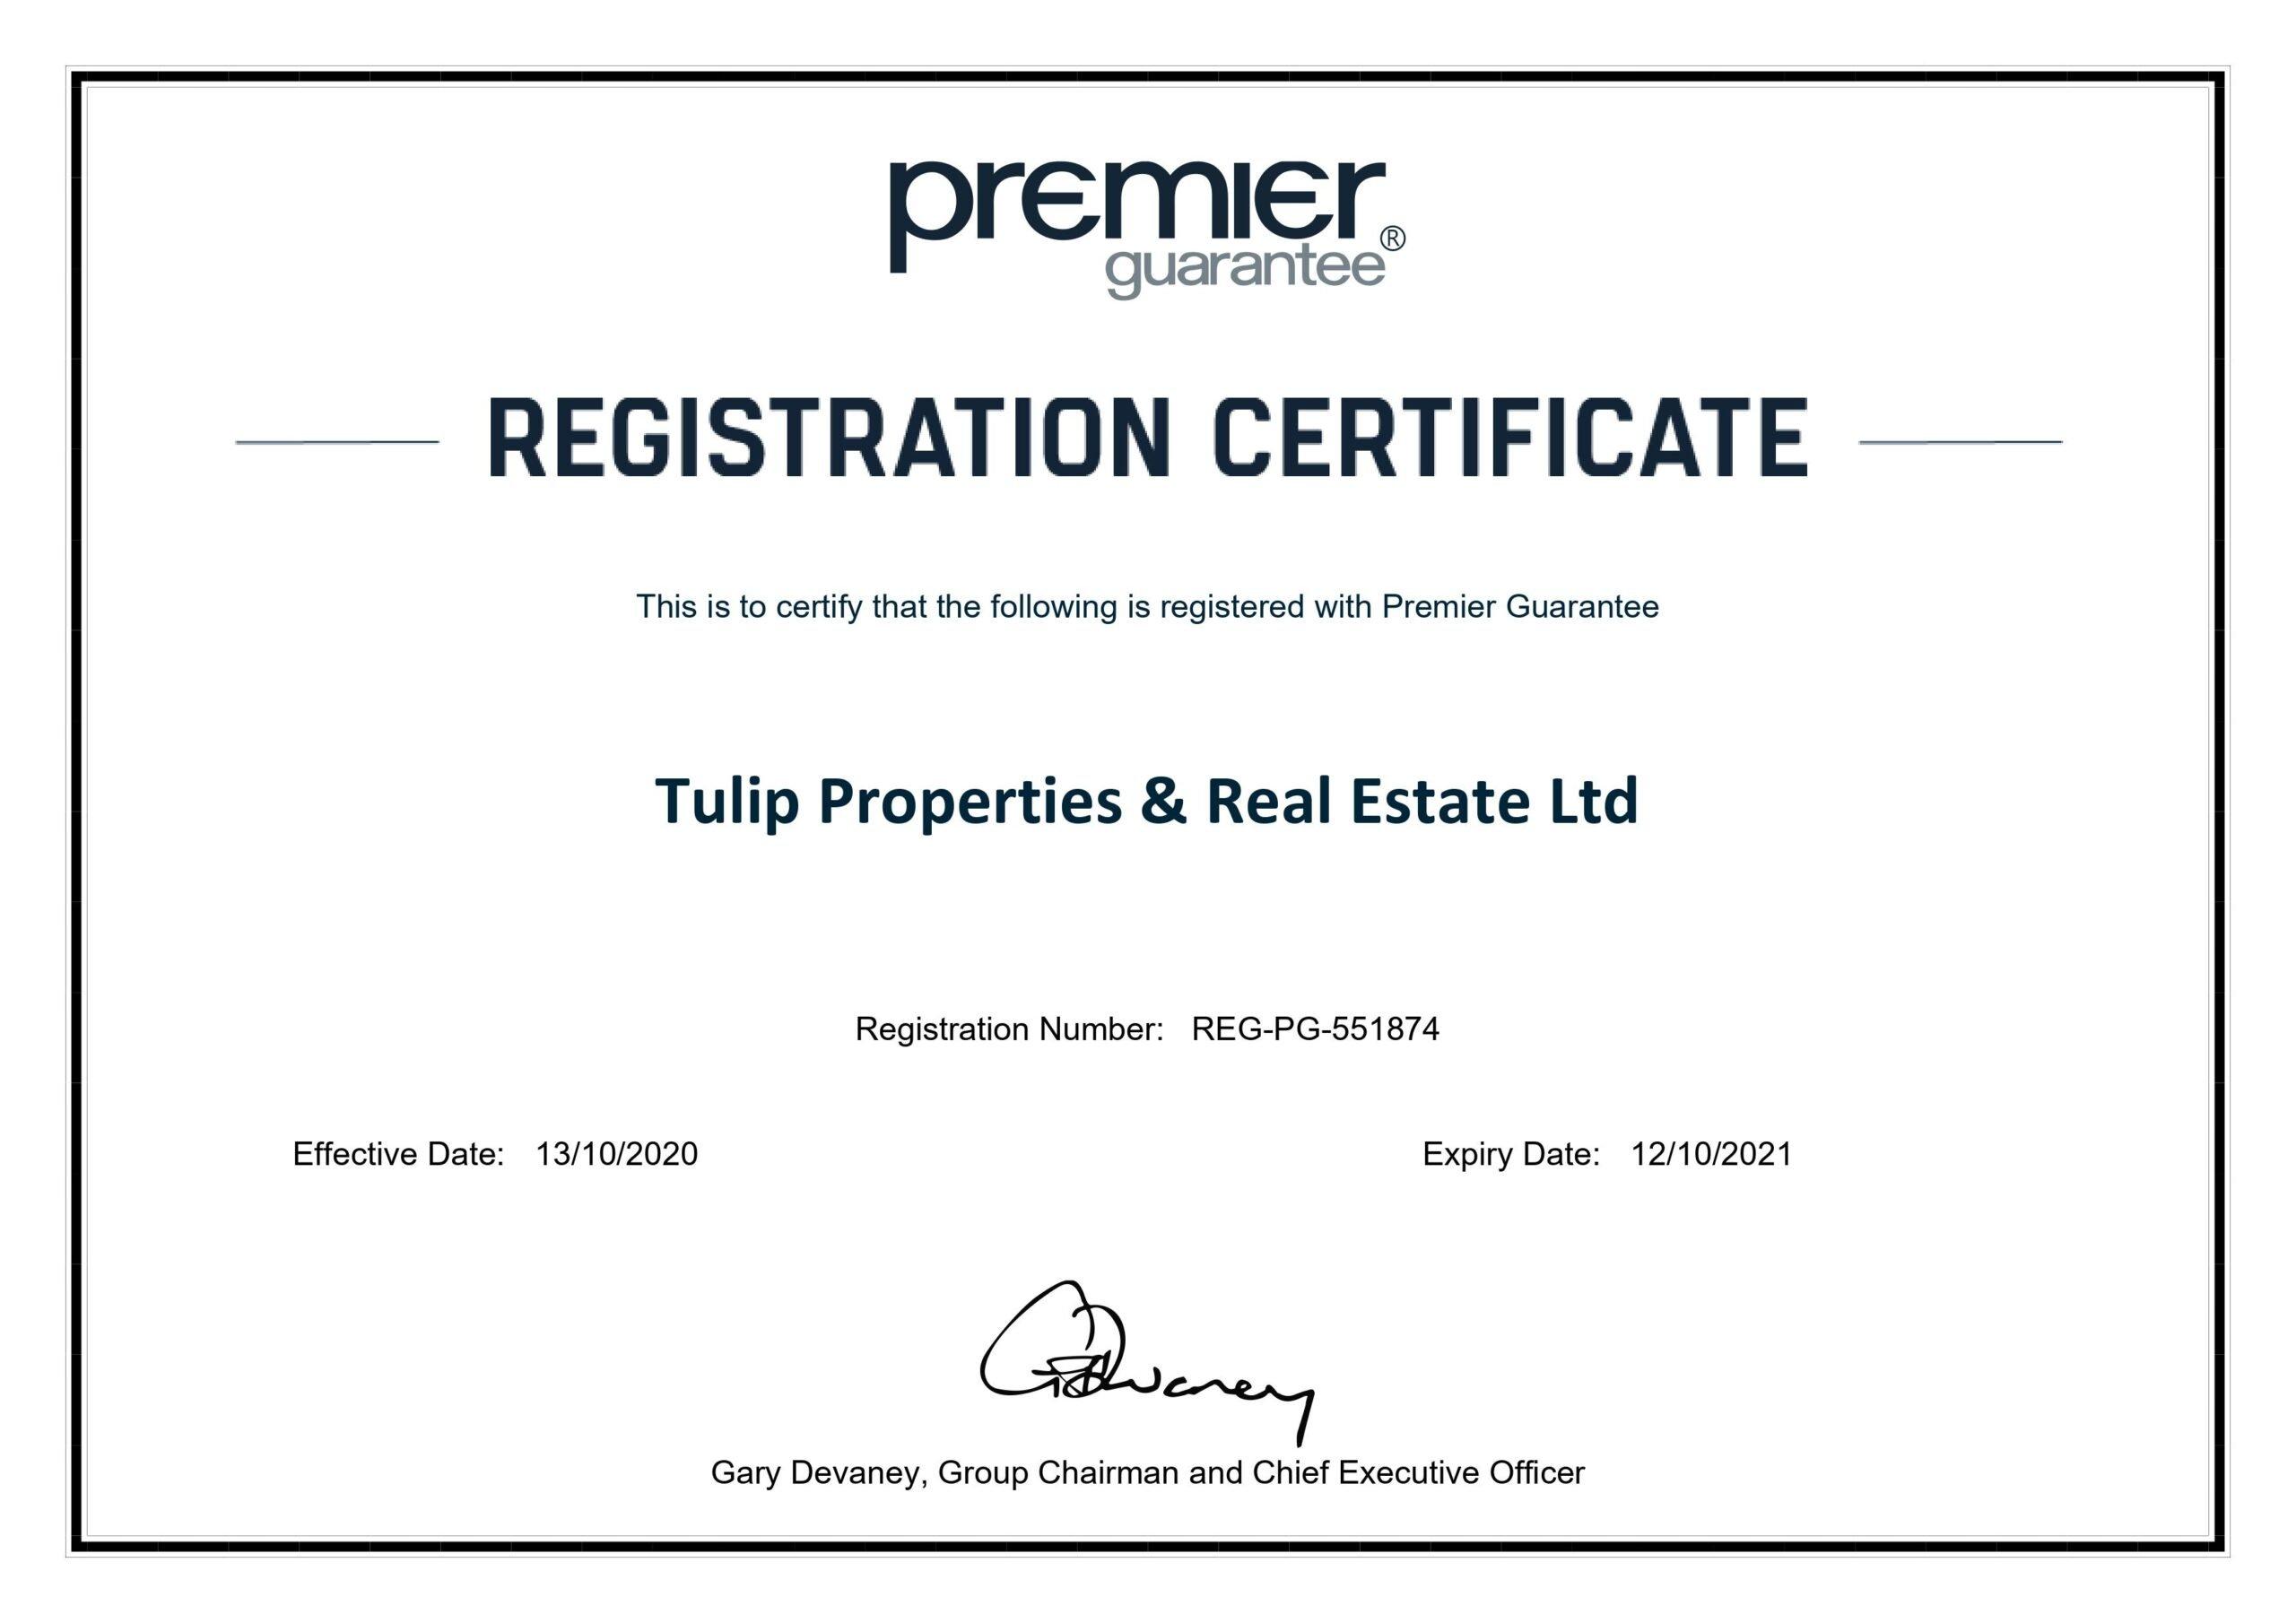 premier registration certificate